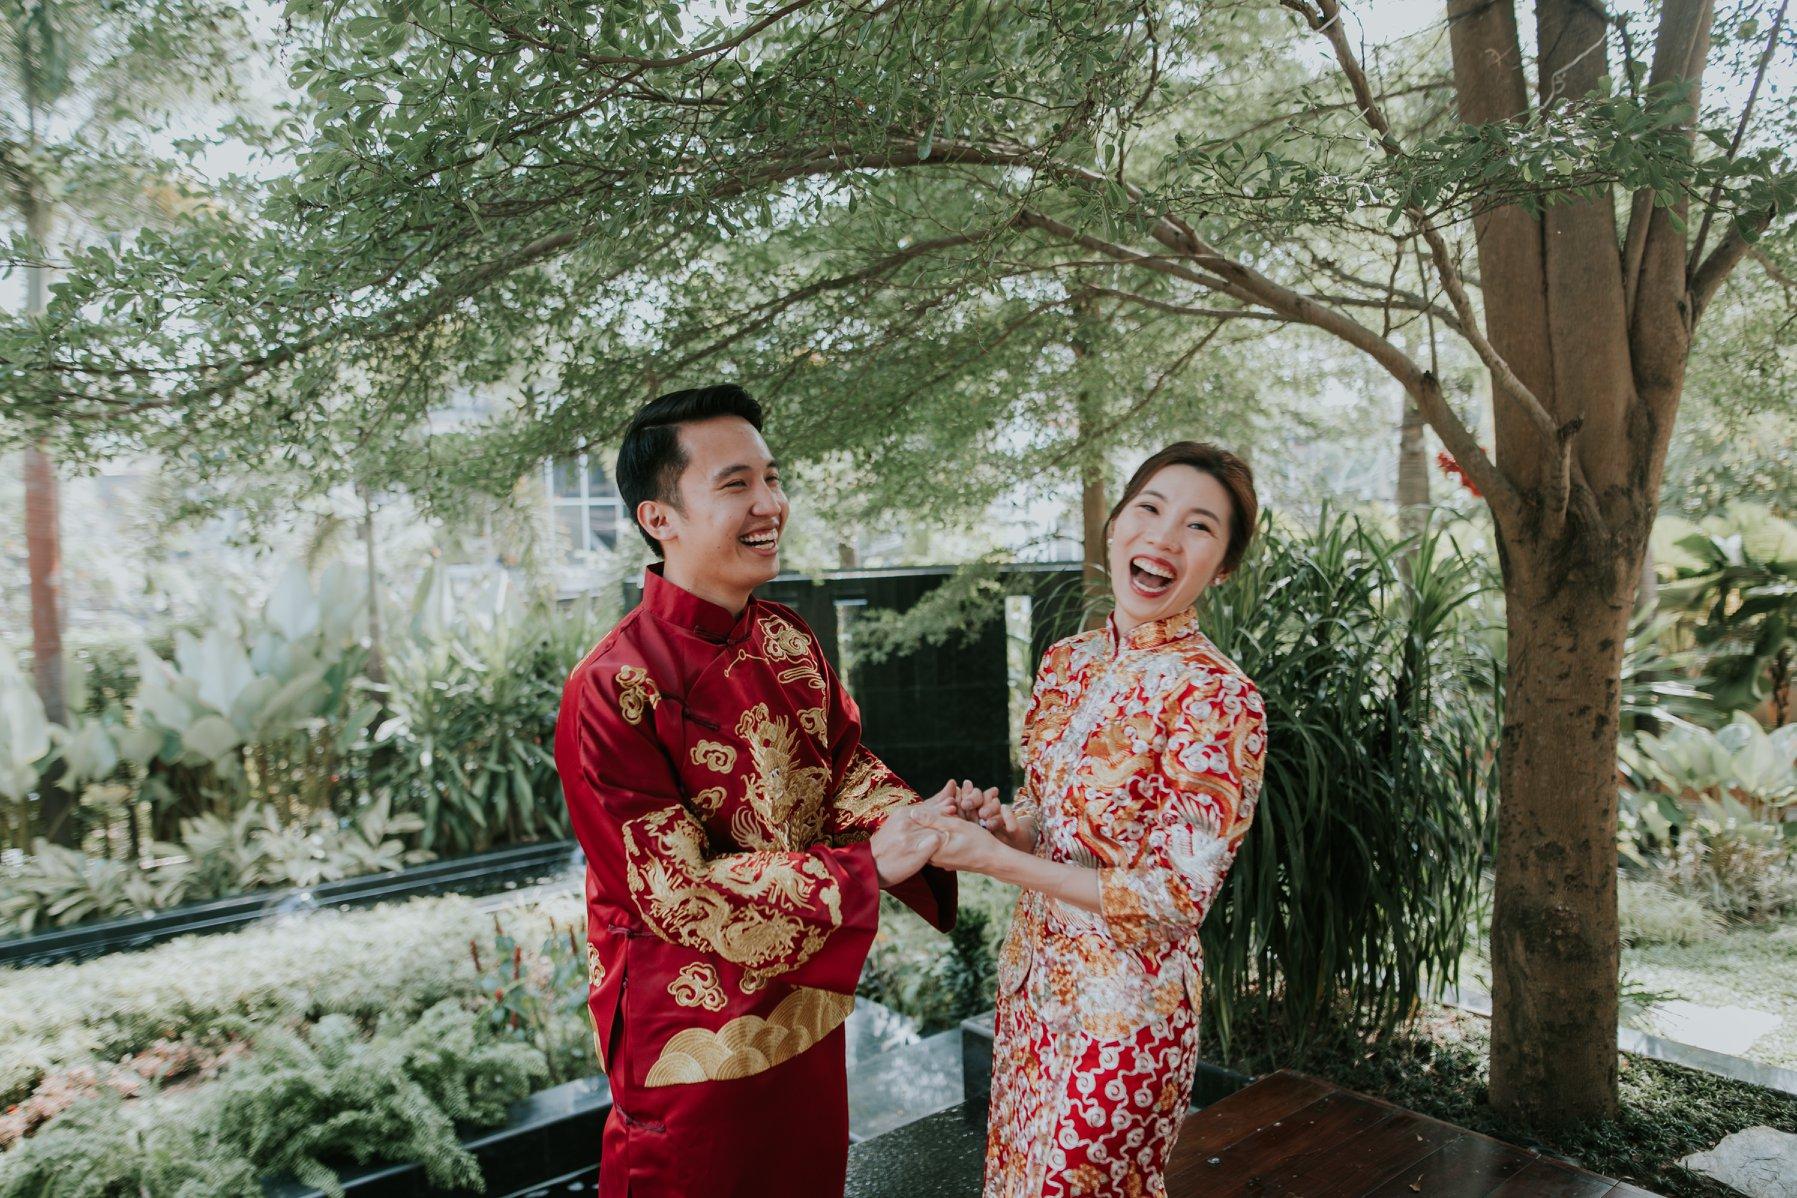 couple qun kua ccm wedding.jpg